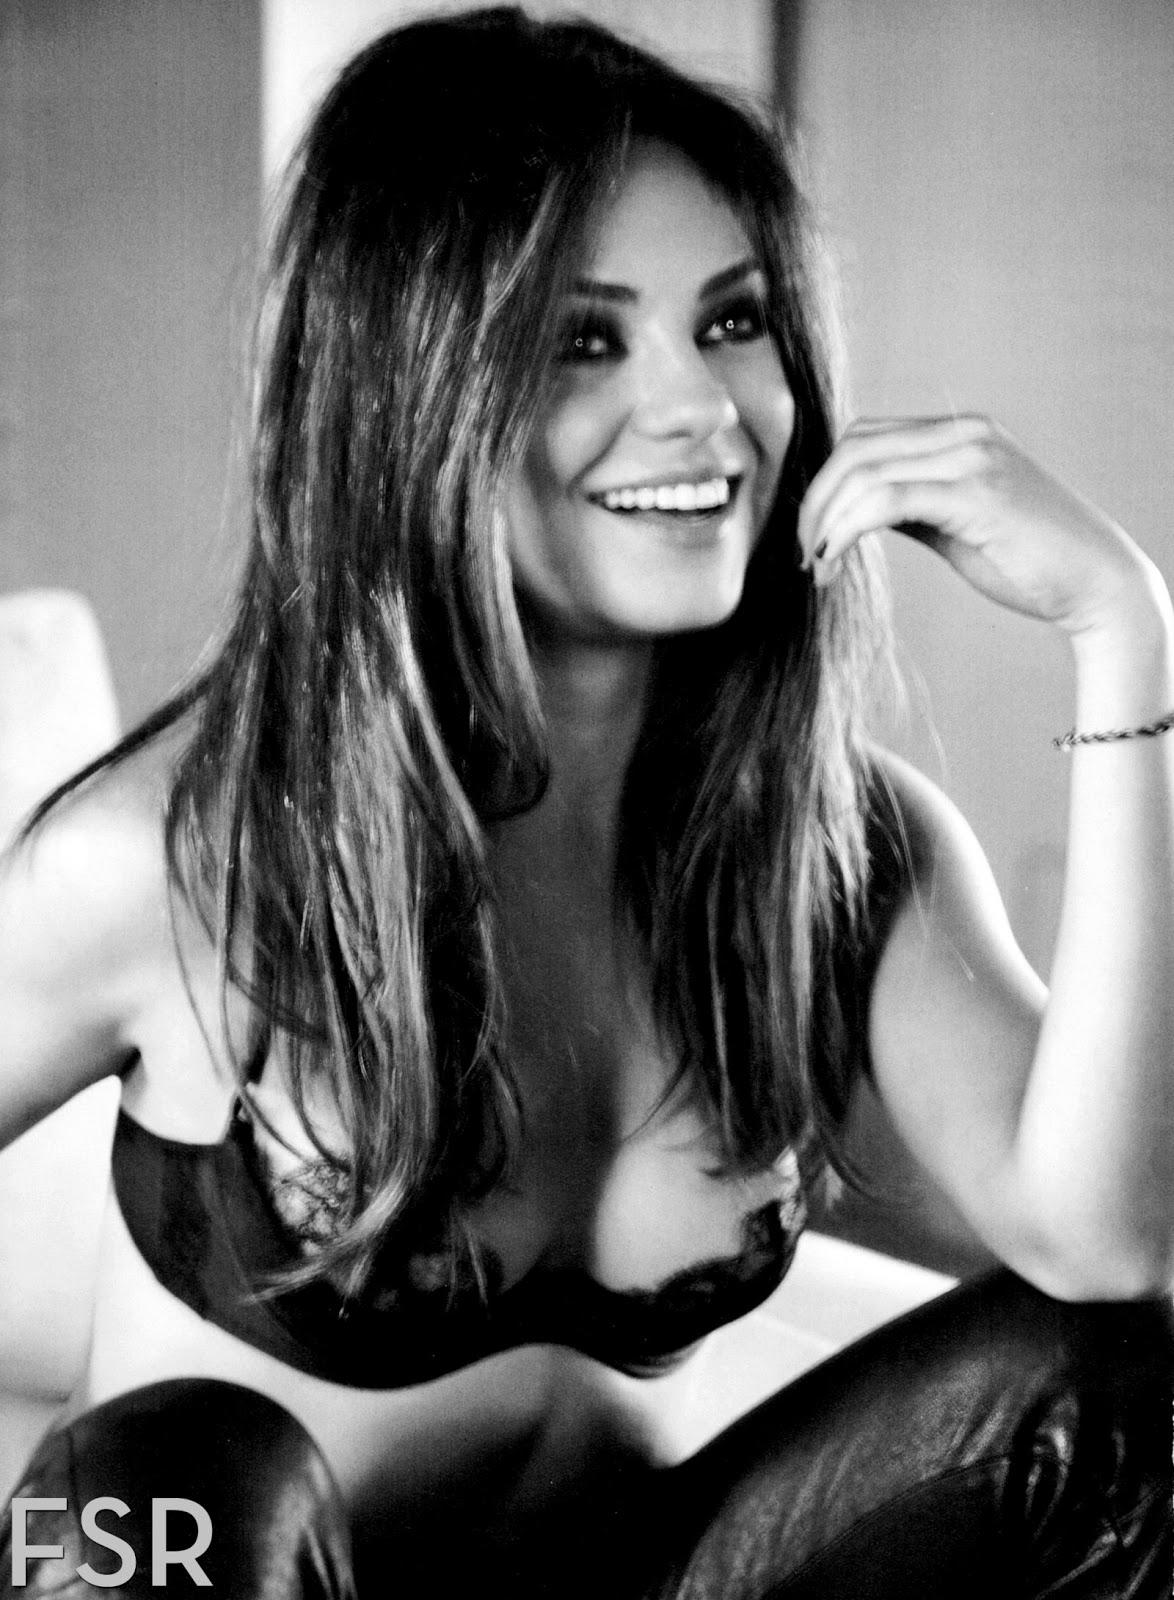 http://2.bp.blogspot.com/-M3BzbArN8lY/UHSiA1yMxrI/AAAAAAAACjQ/xoCSR7MXz50/s1600/Mila-Kunis-esquire-novembro-2012-mulher-mais-sexy-do-mundo-4.jpg